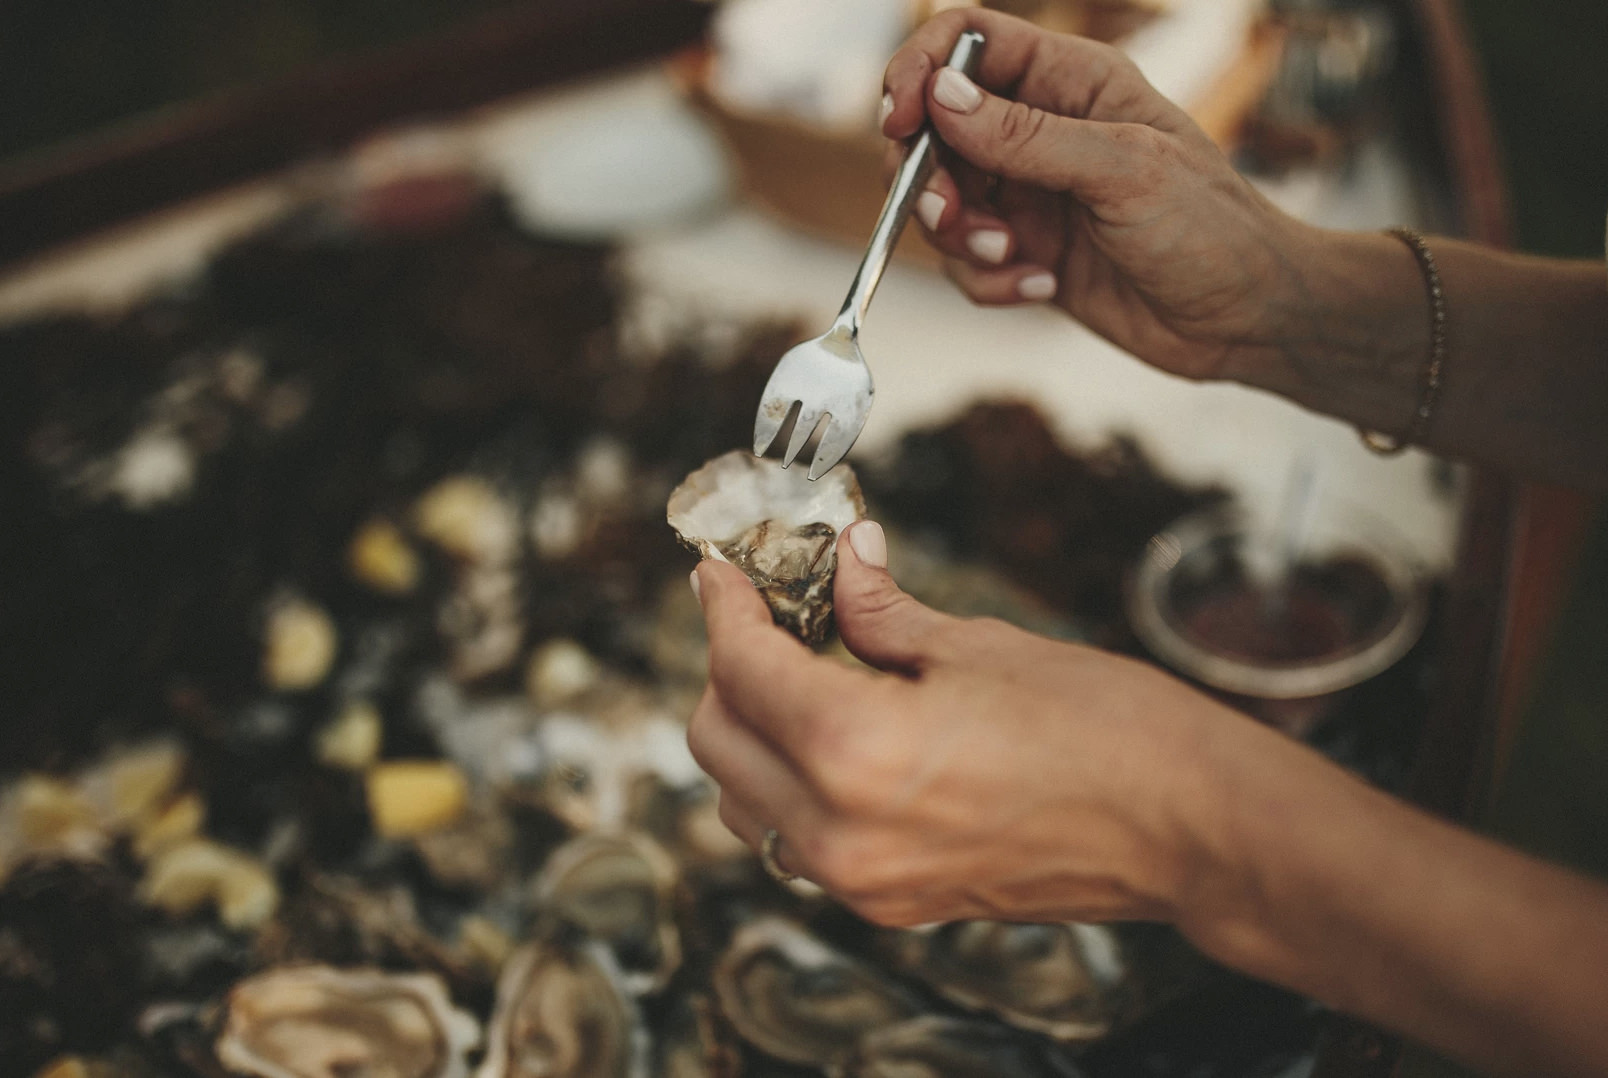 Huîtres saison mariage buffet